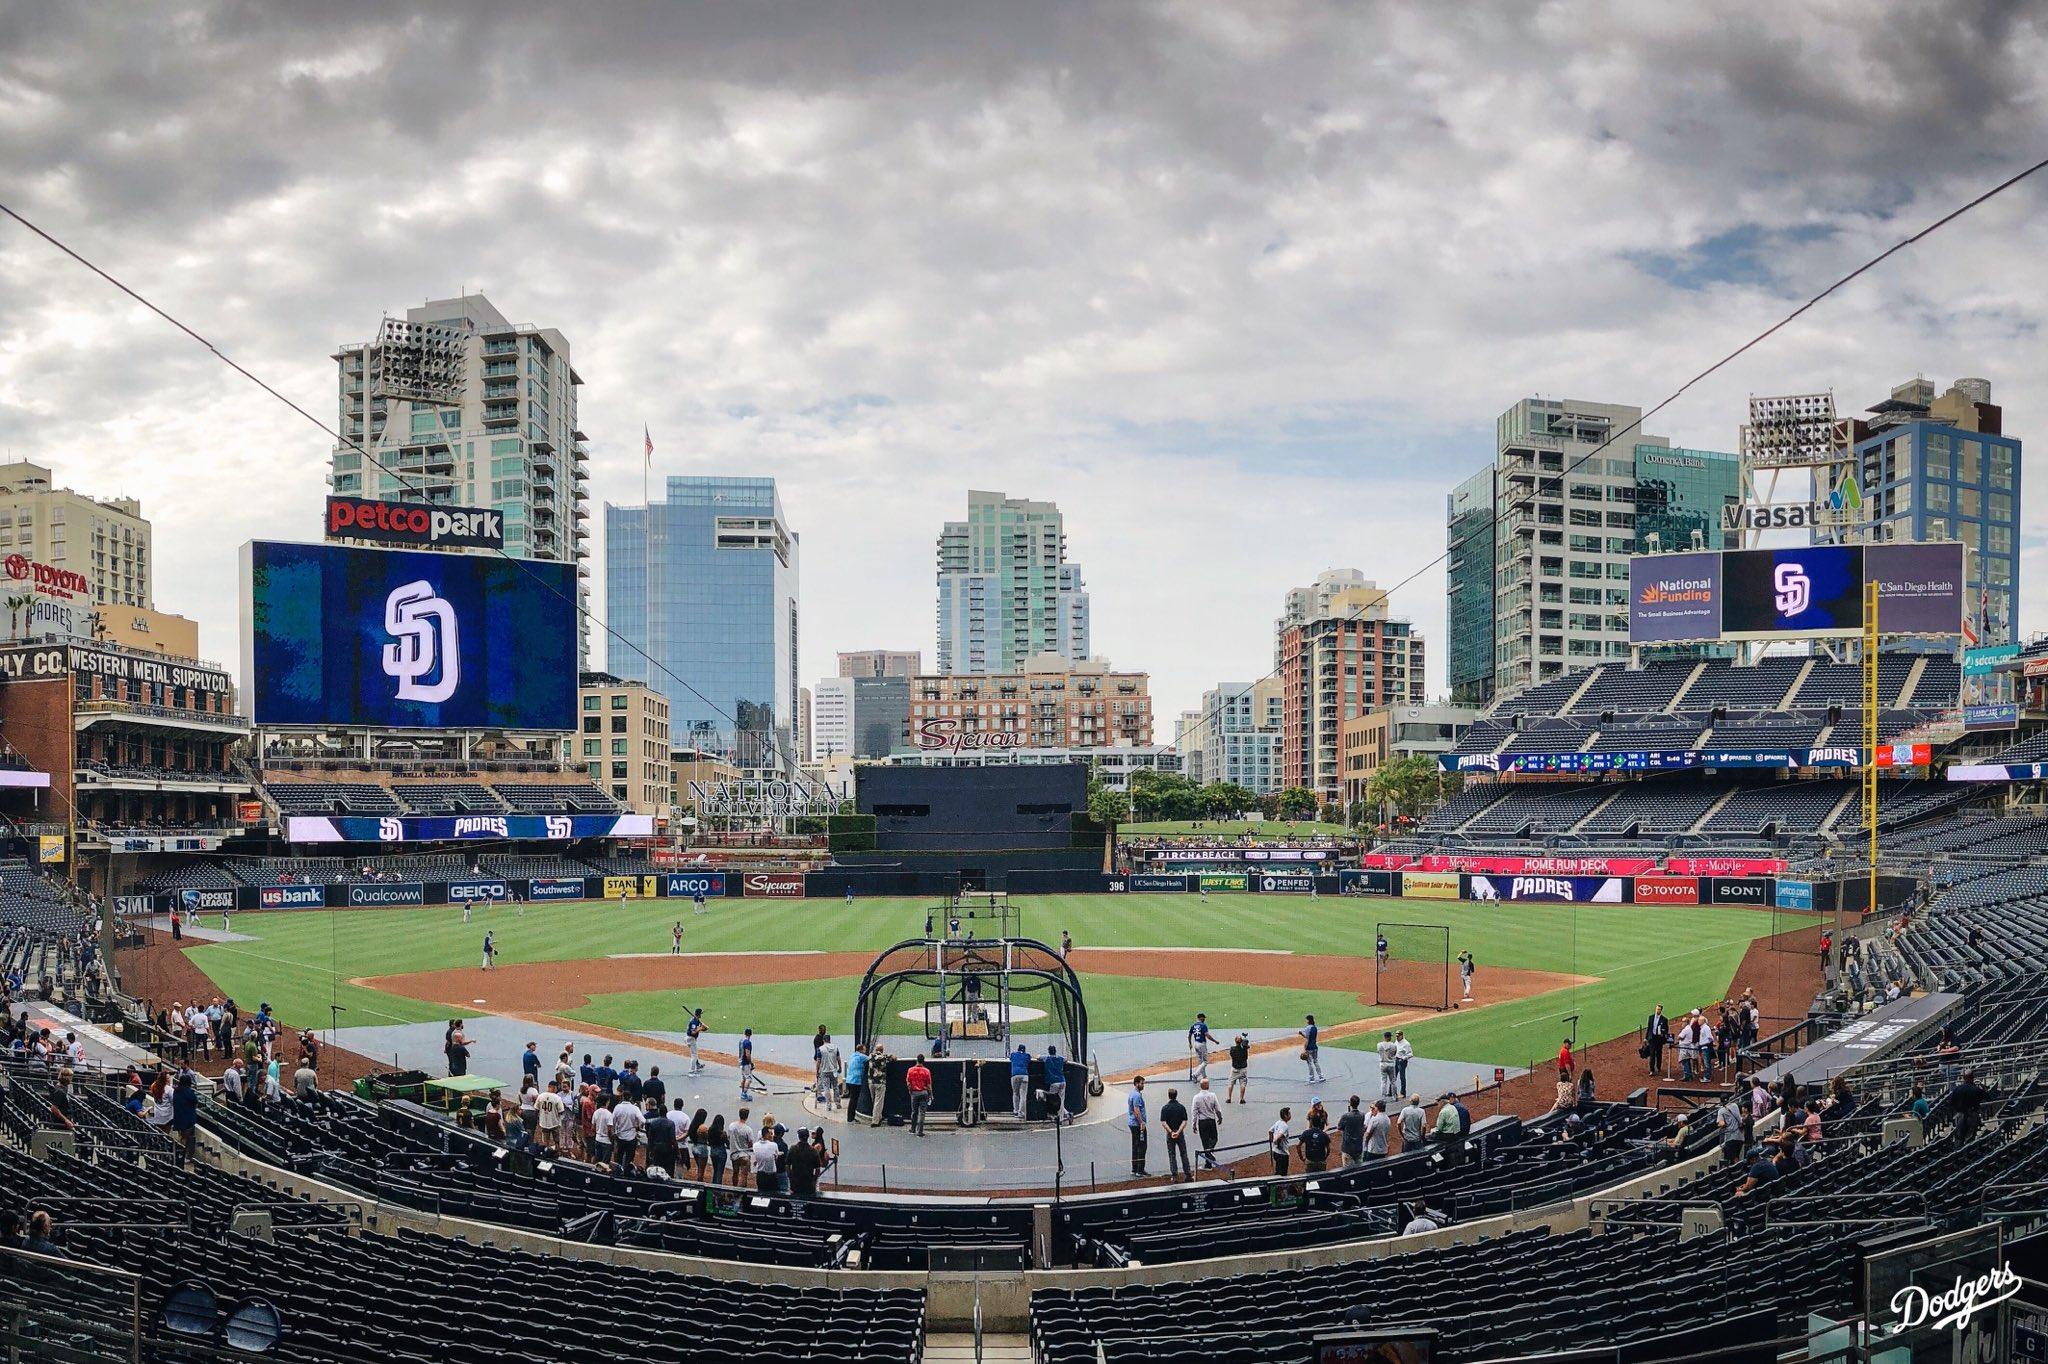 Time to work. #Dodgers https://t.co/CTuZjSc7kS